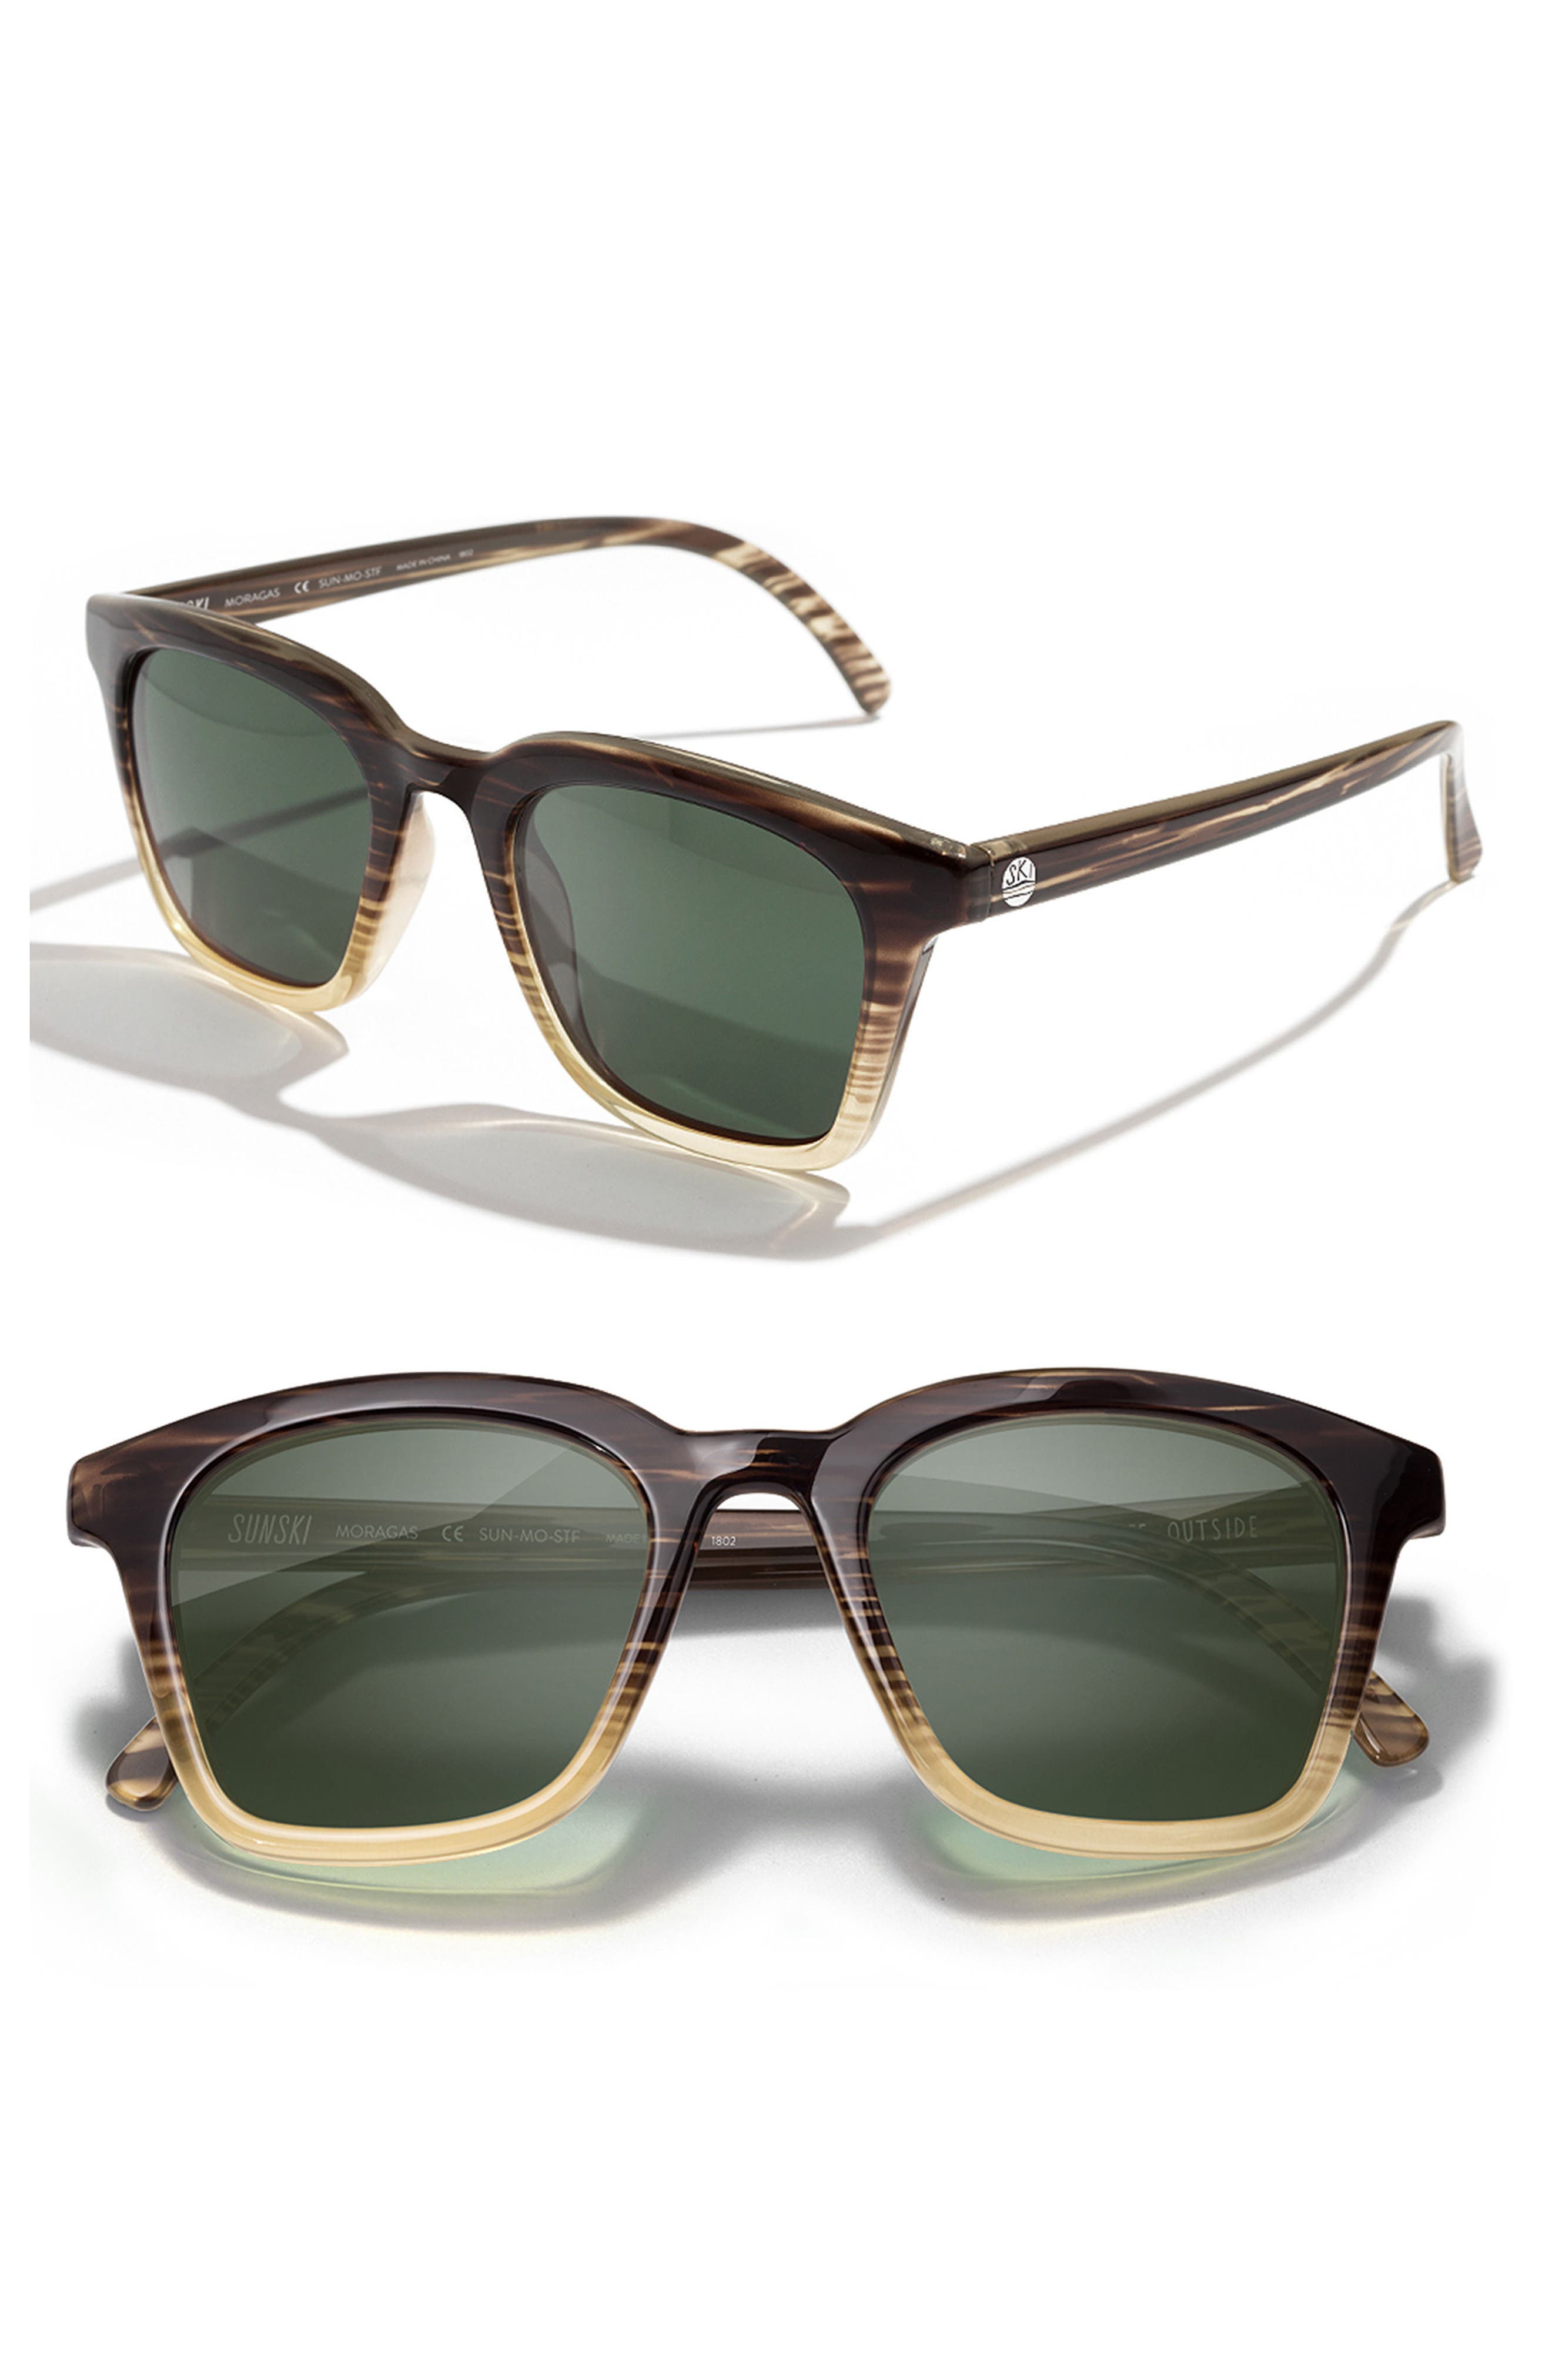 Sunski Moraga 47Mm Polarized Sunglasses - Stripe Tortoise Forest